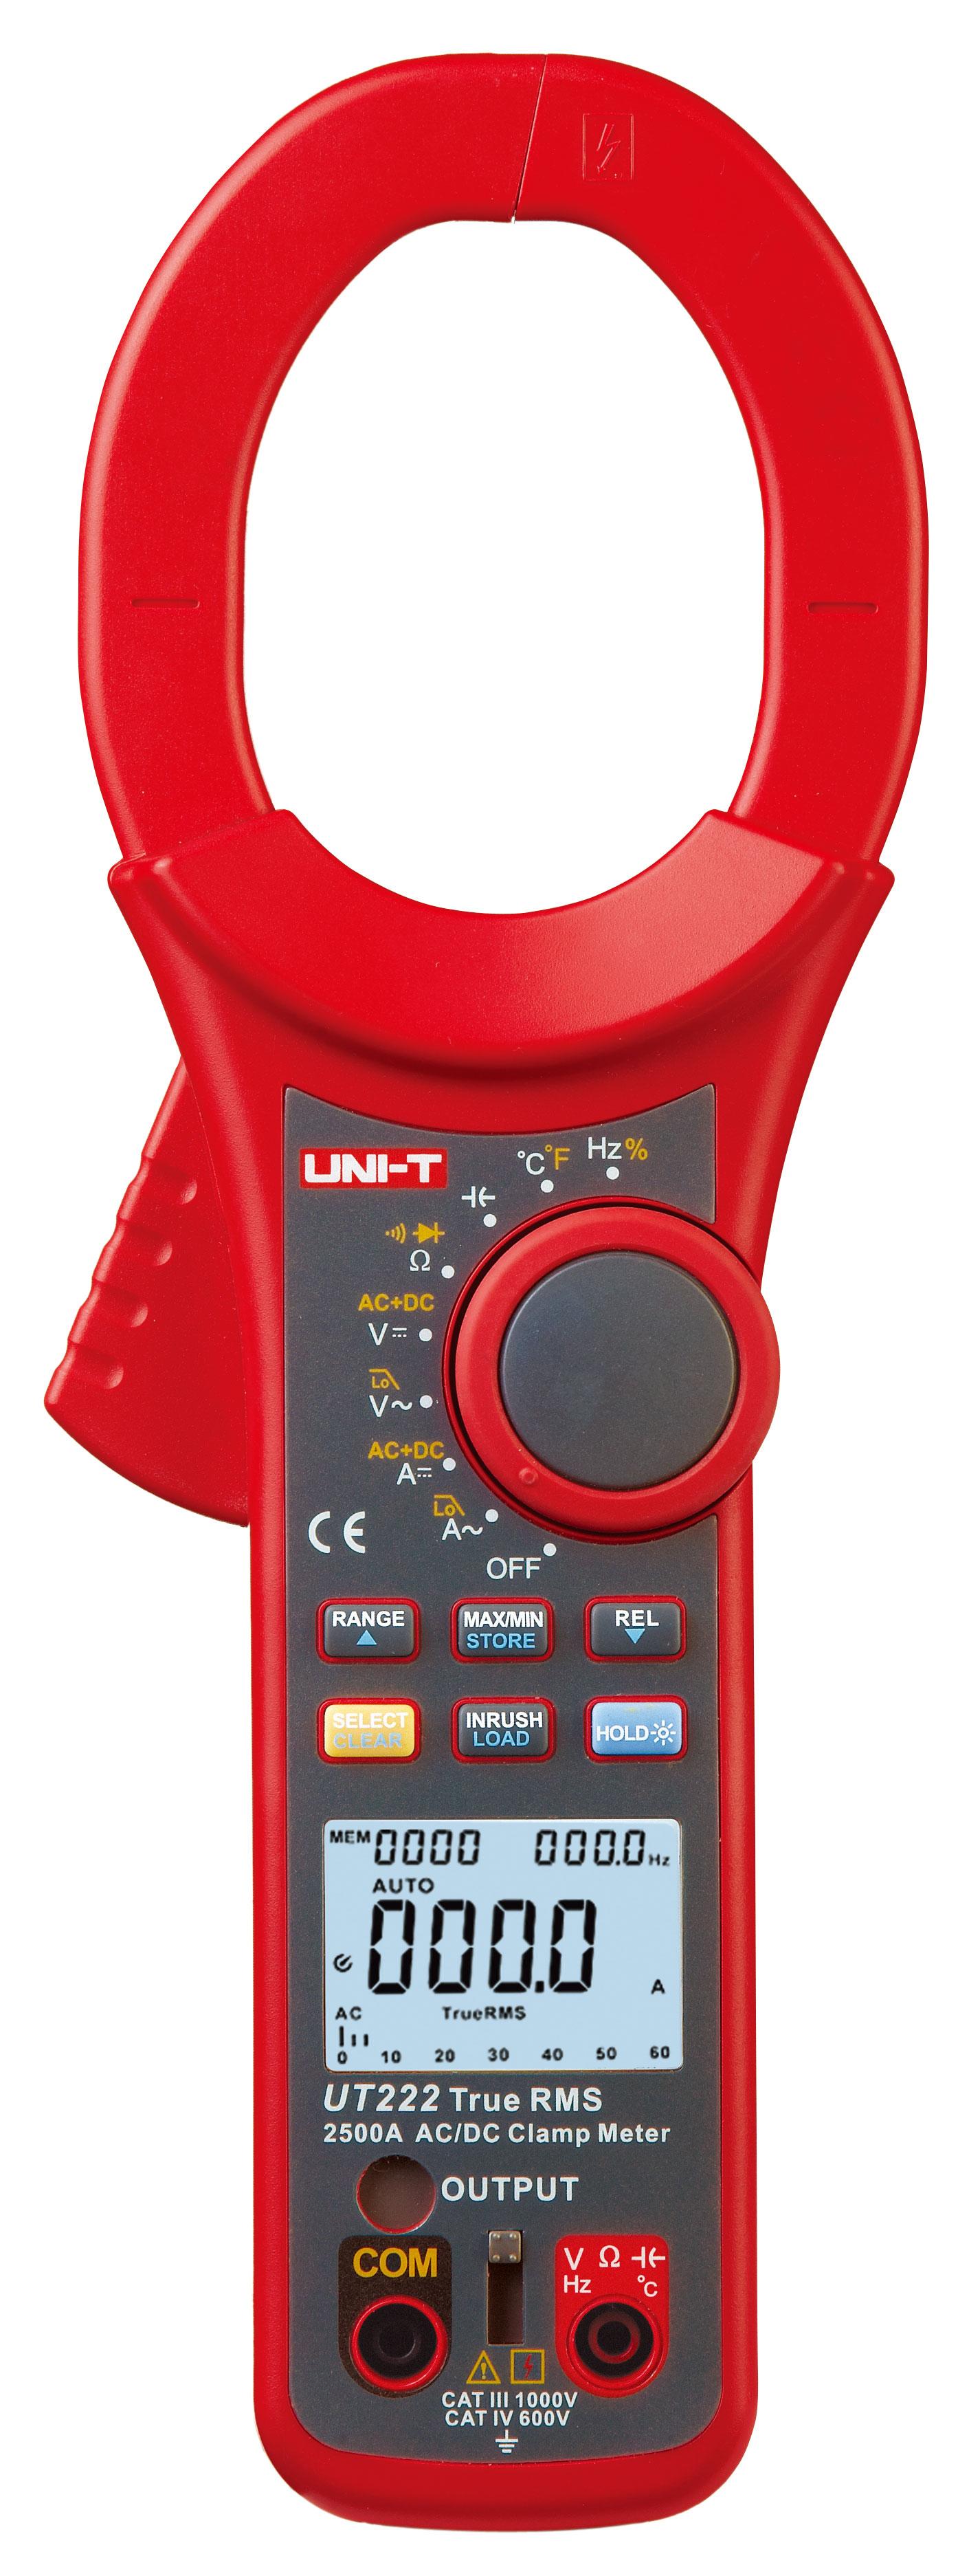 UNI-T UT222 2500A 数字钳形表